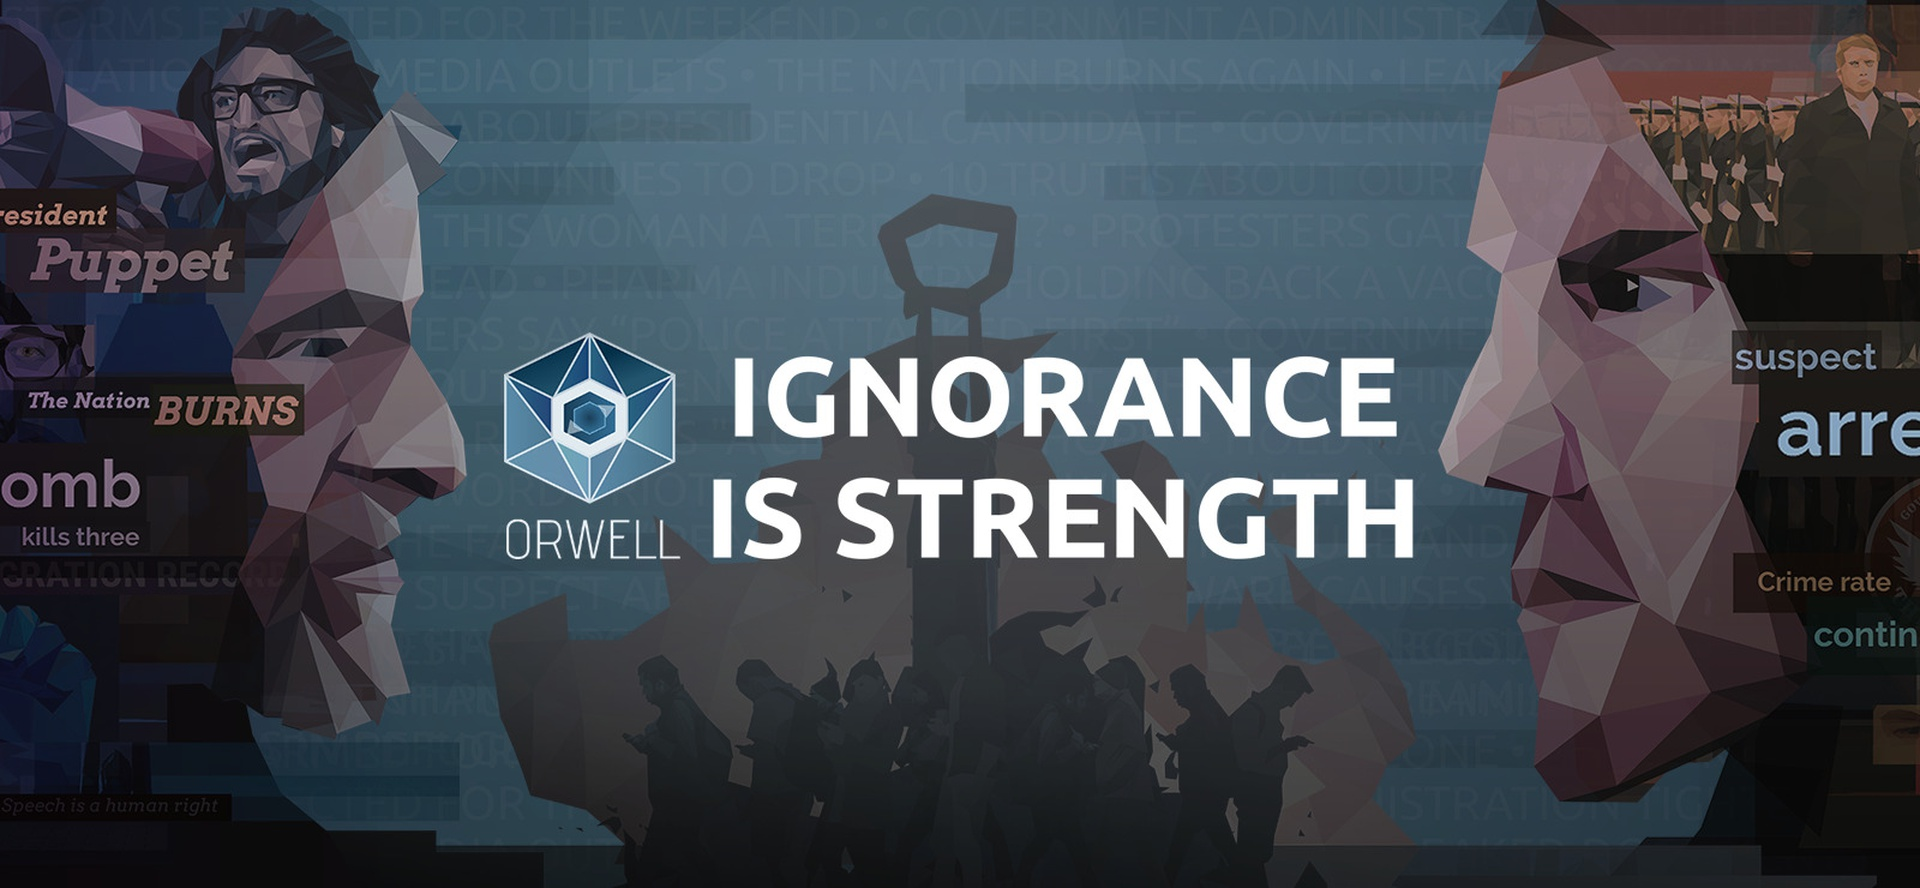 Orwell - Ignorance is Strength